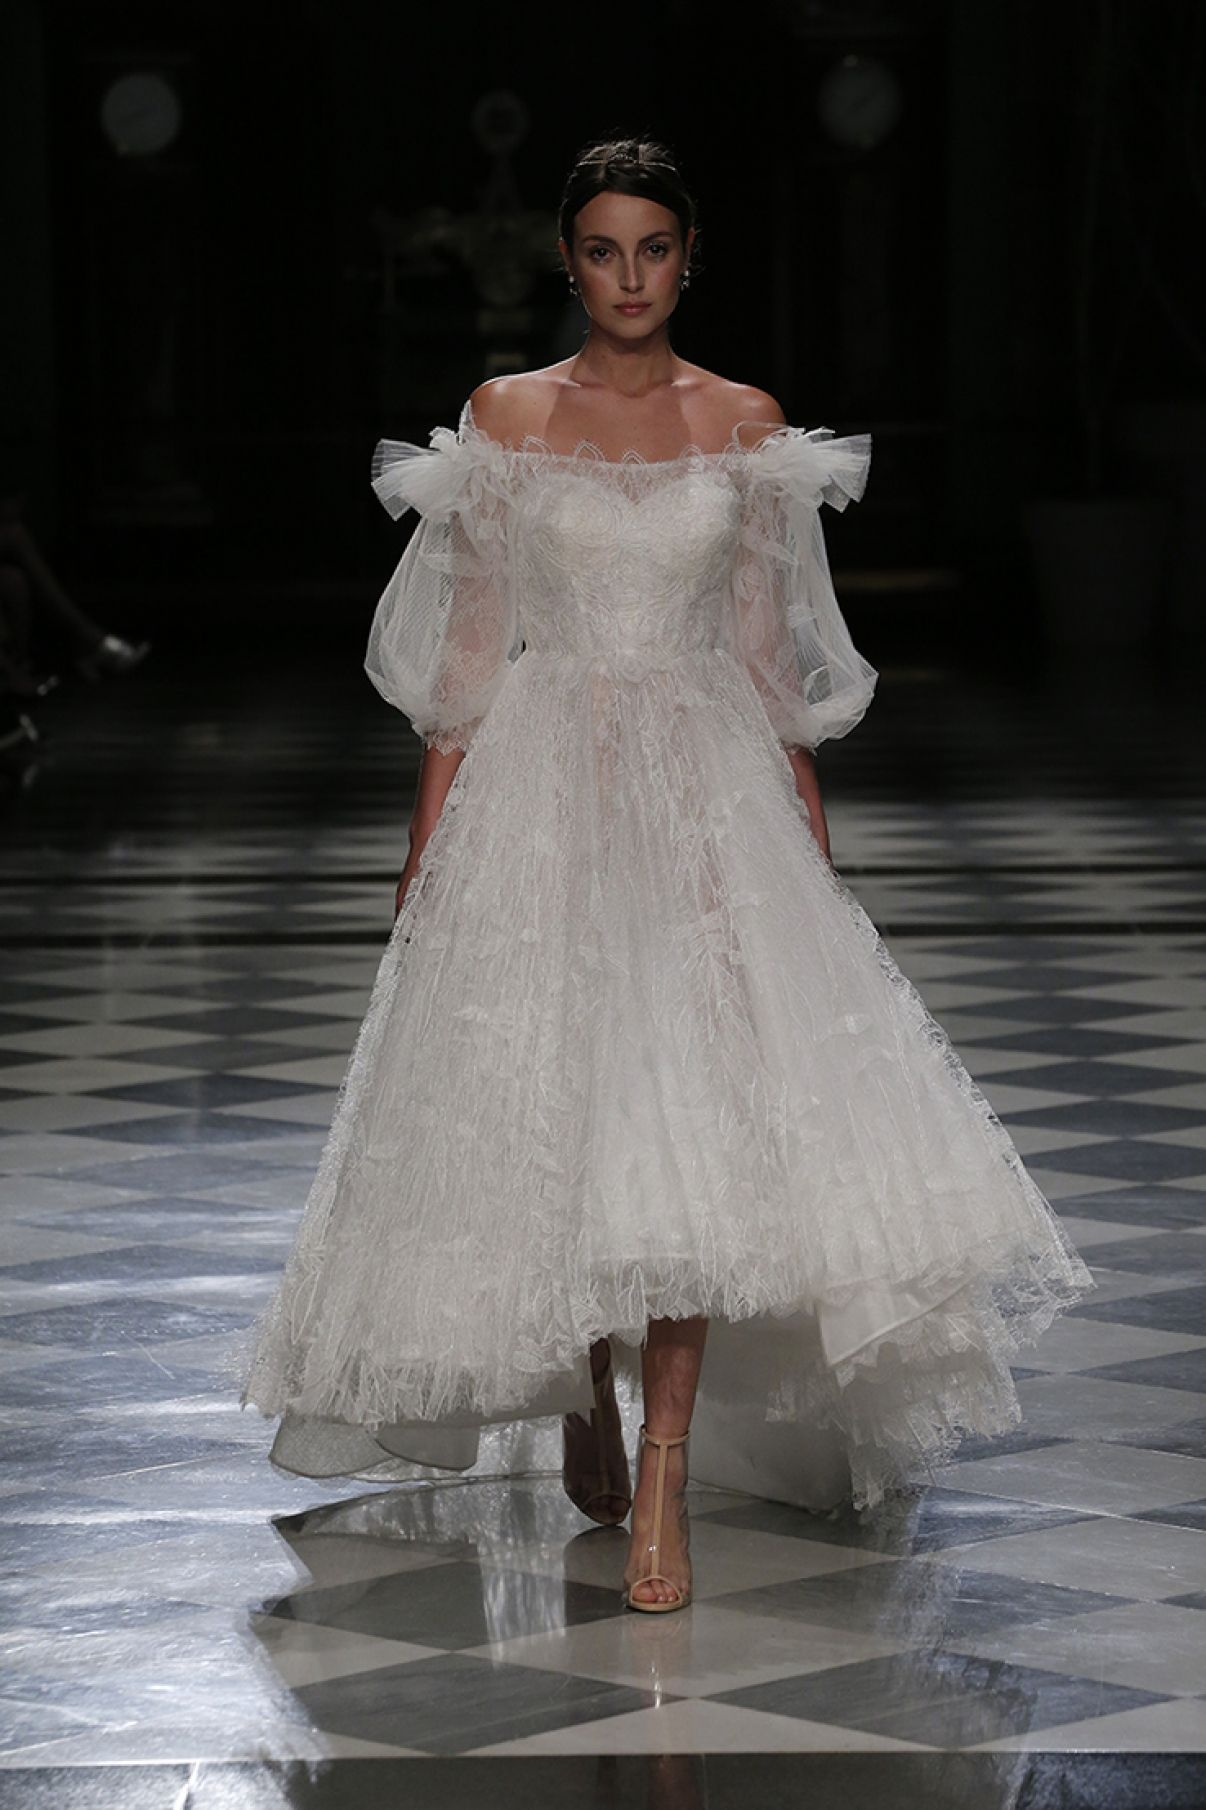 Custom made wedding dress  NAMCHA haute couture bride dresses romantic bride dresses high